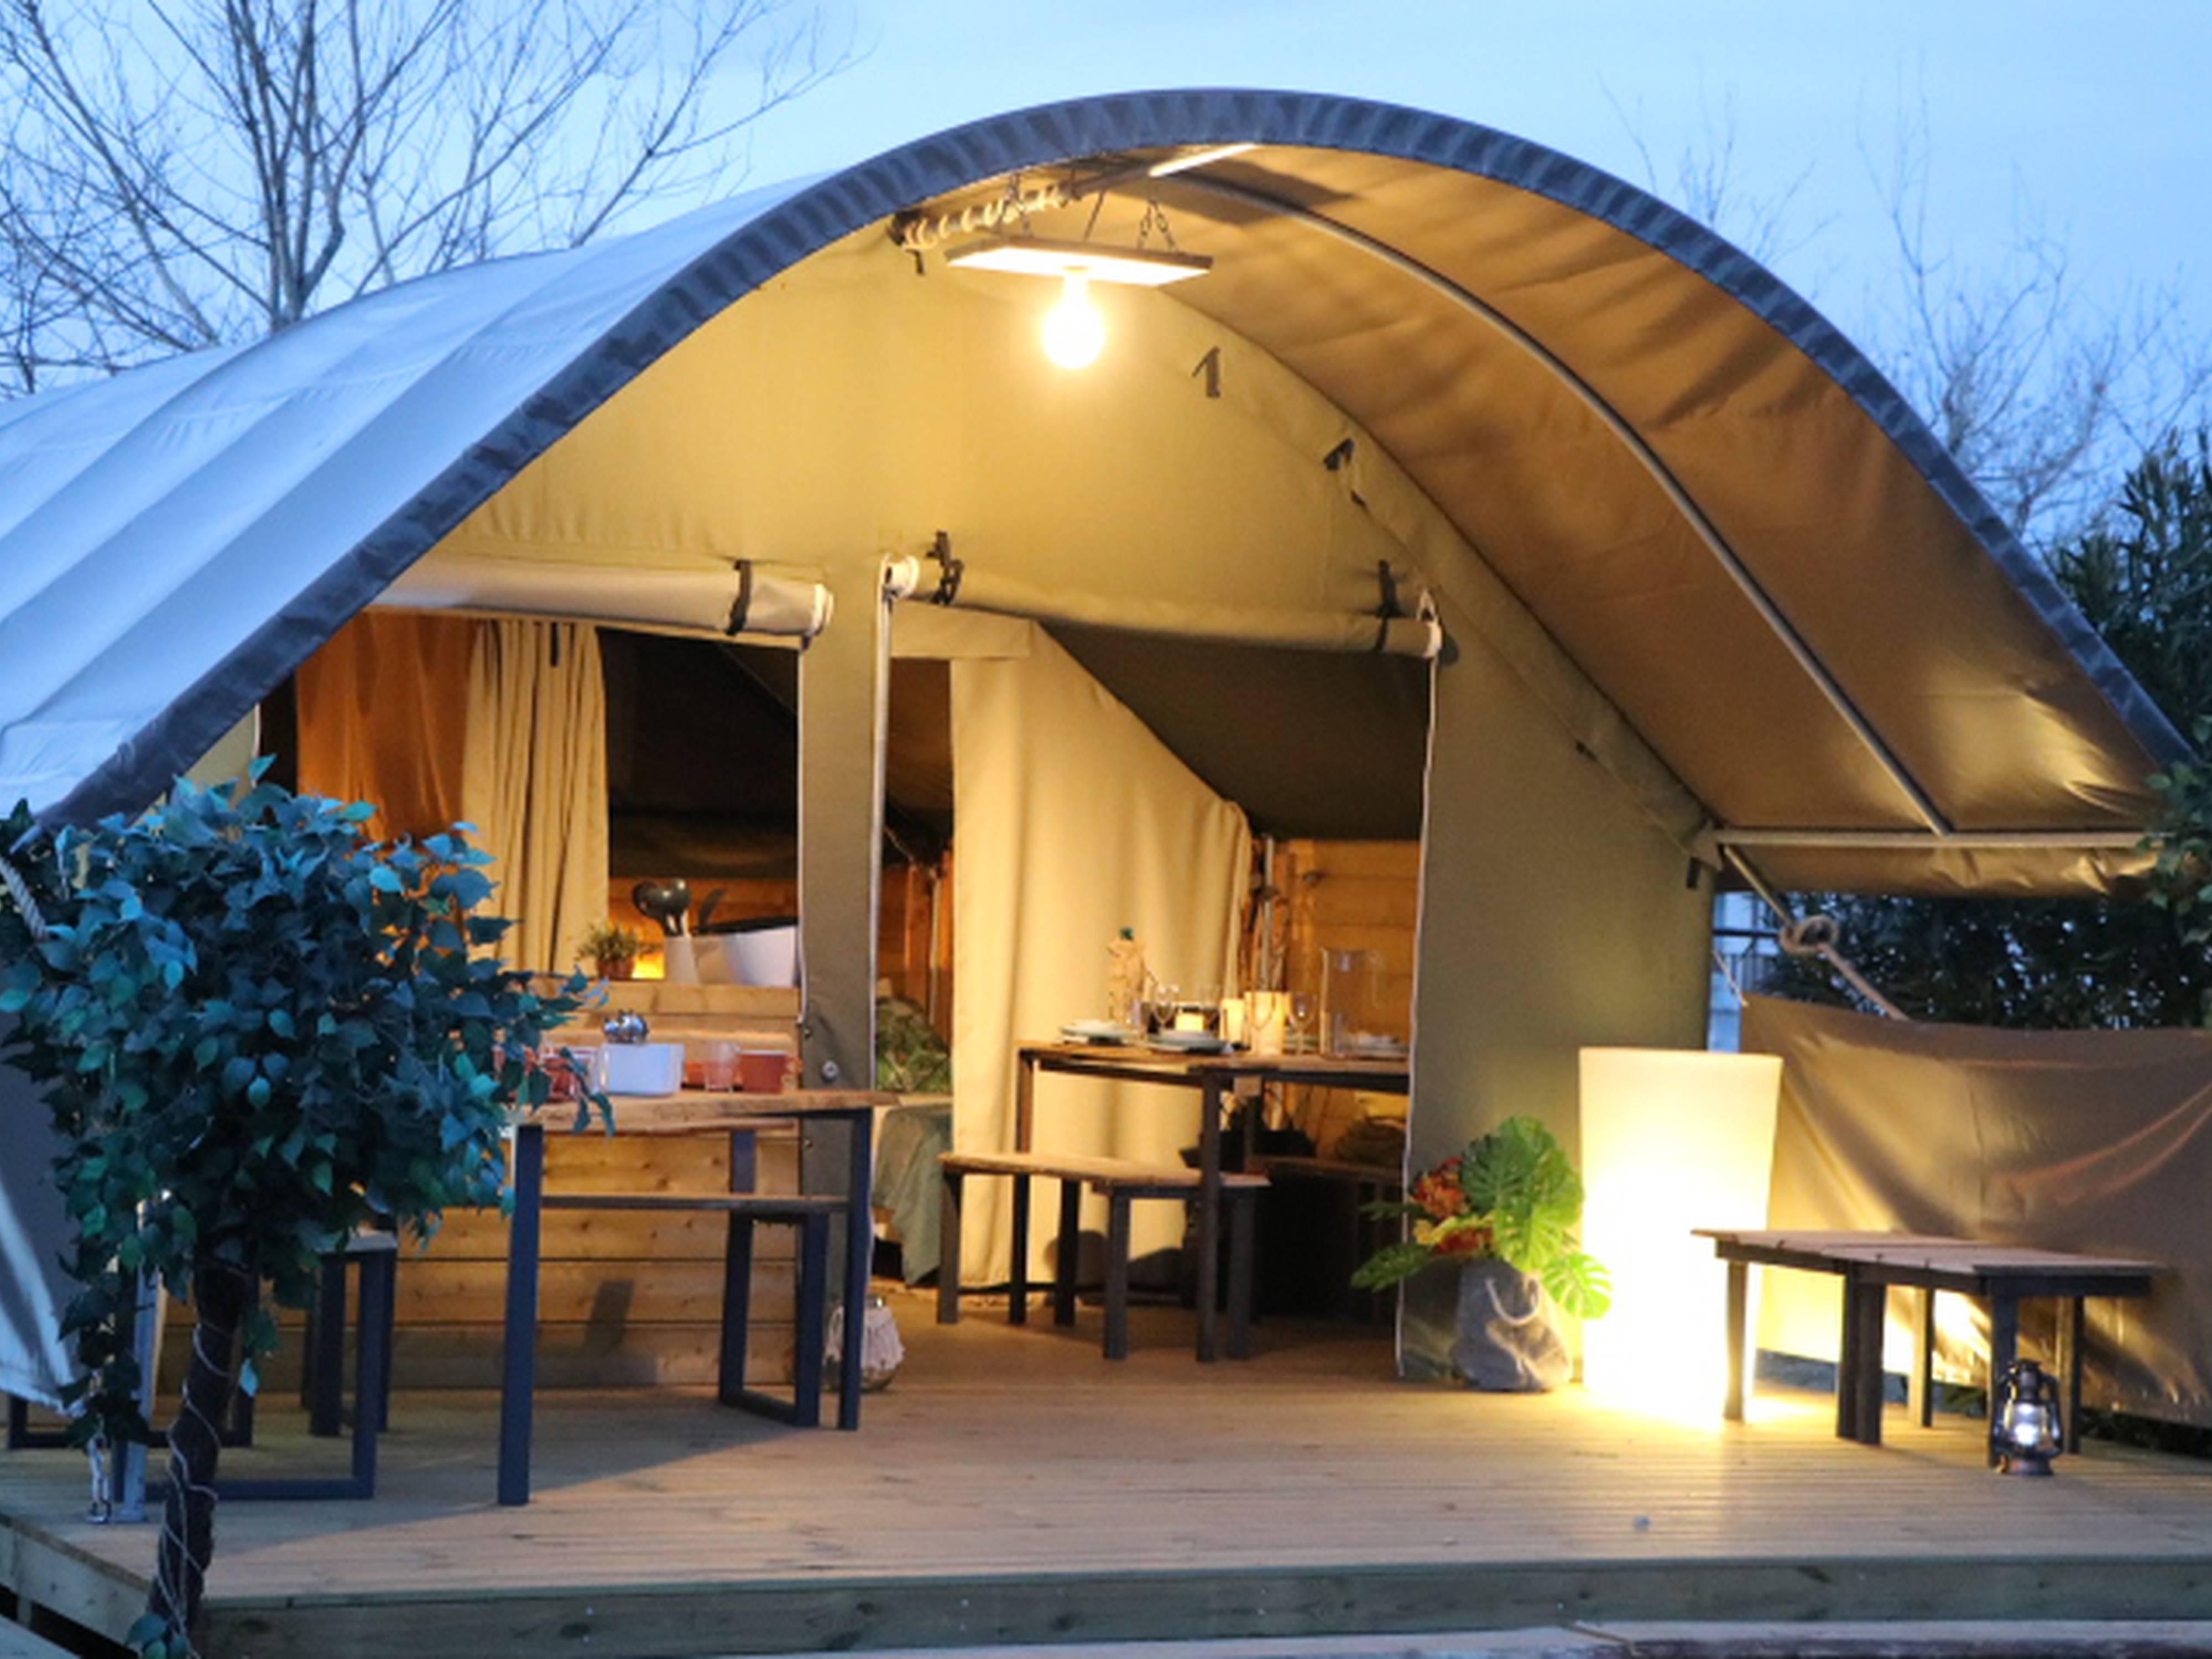 Tente toile & bois KIBO Camping Le Viaduc